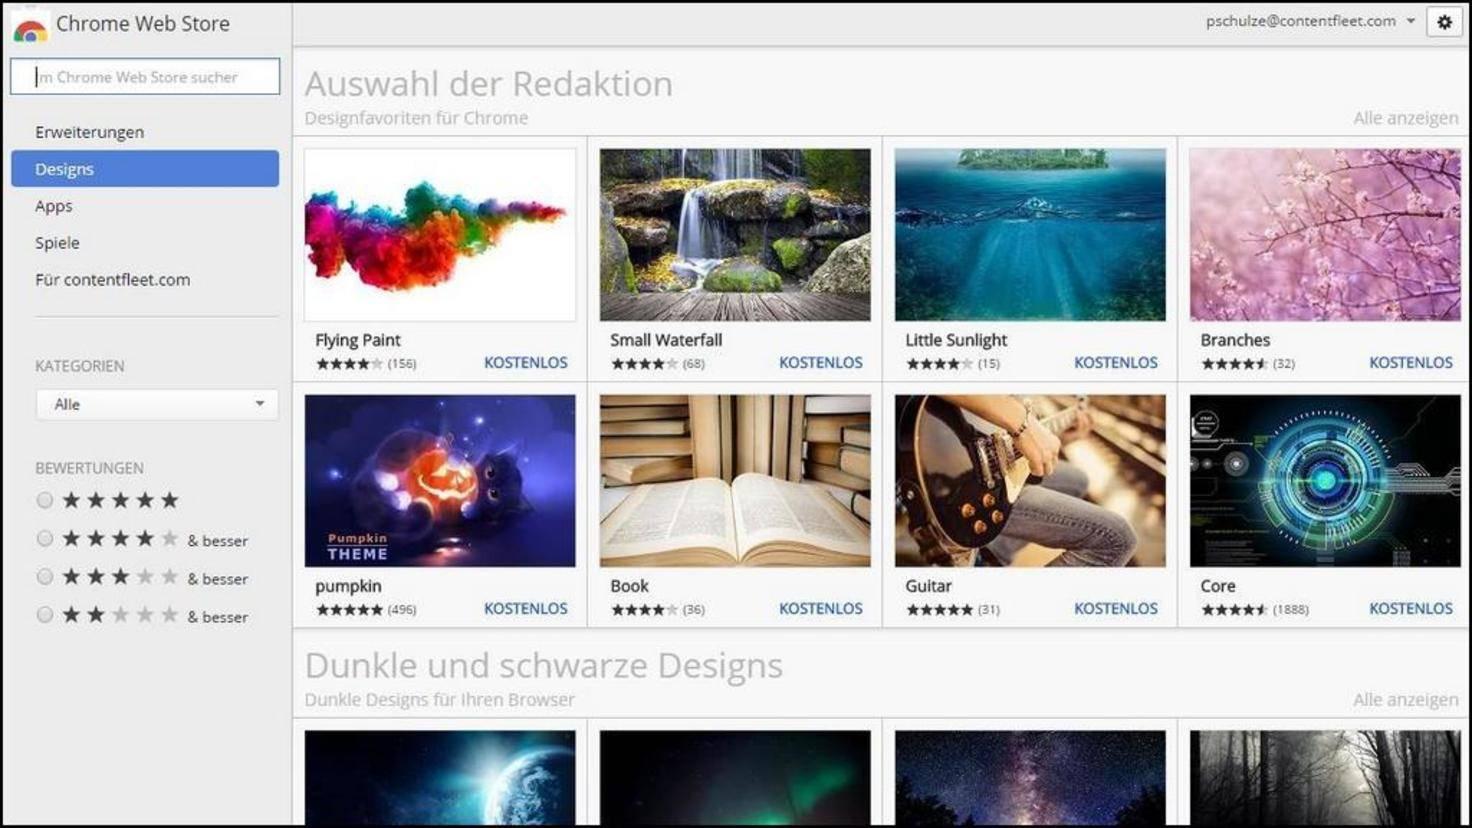 Chrome Web Store 02